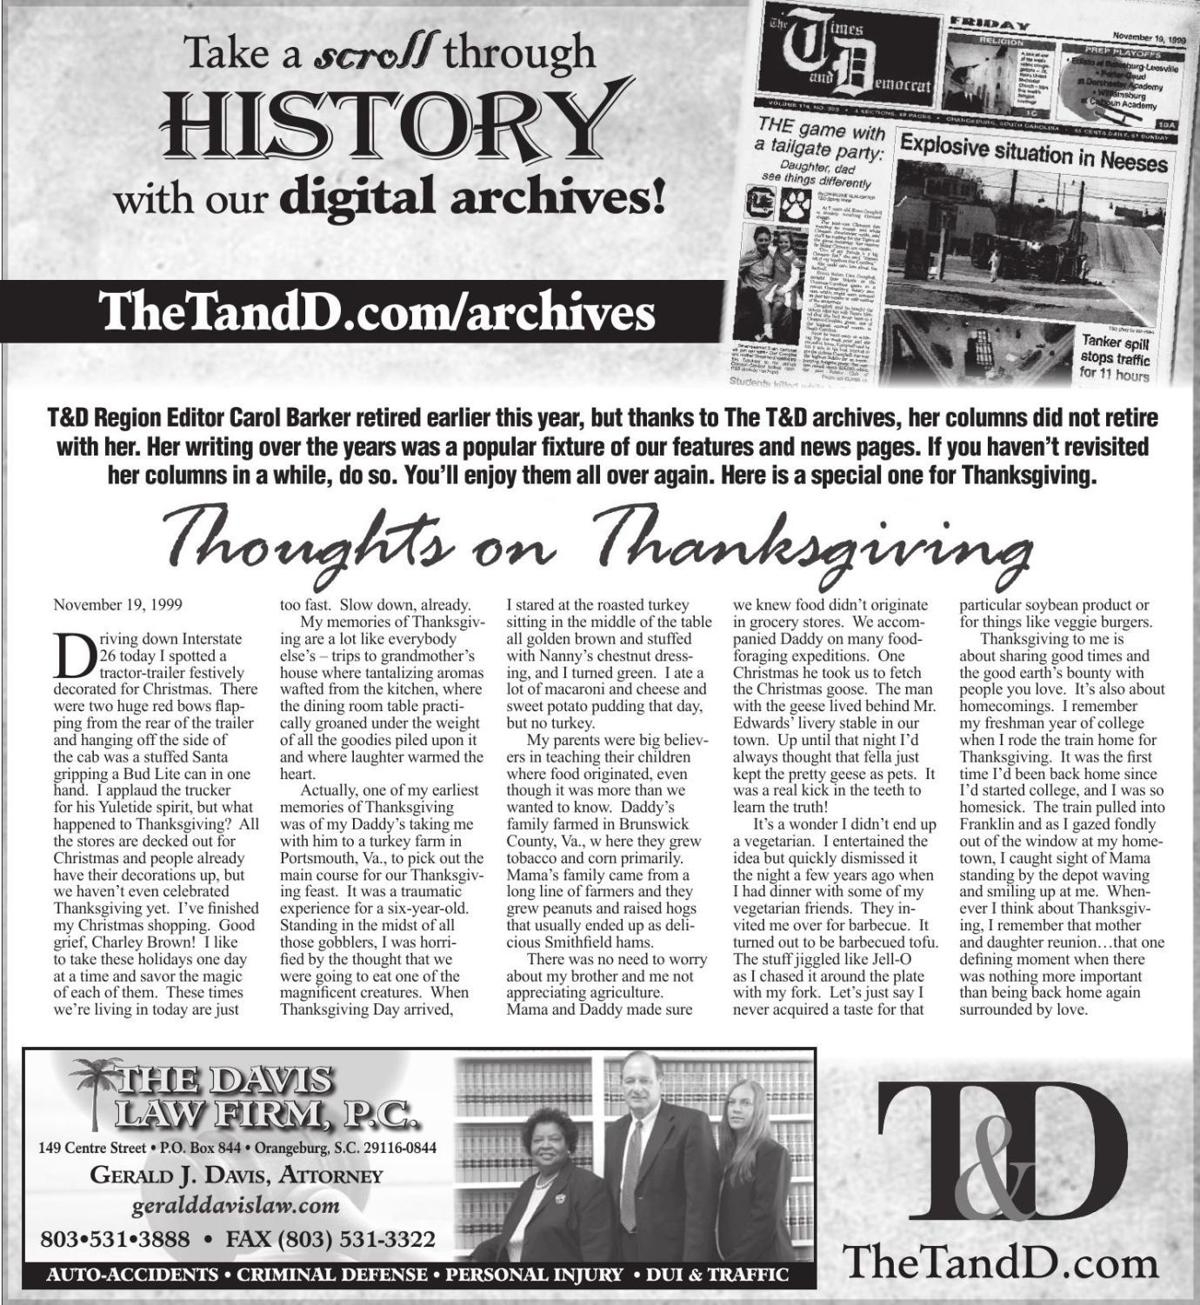 TheTandD.com/archives Nov. 24, 2019